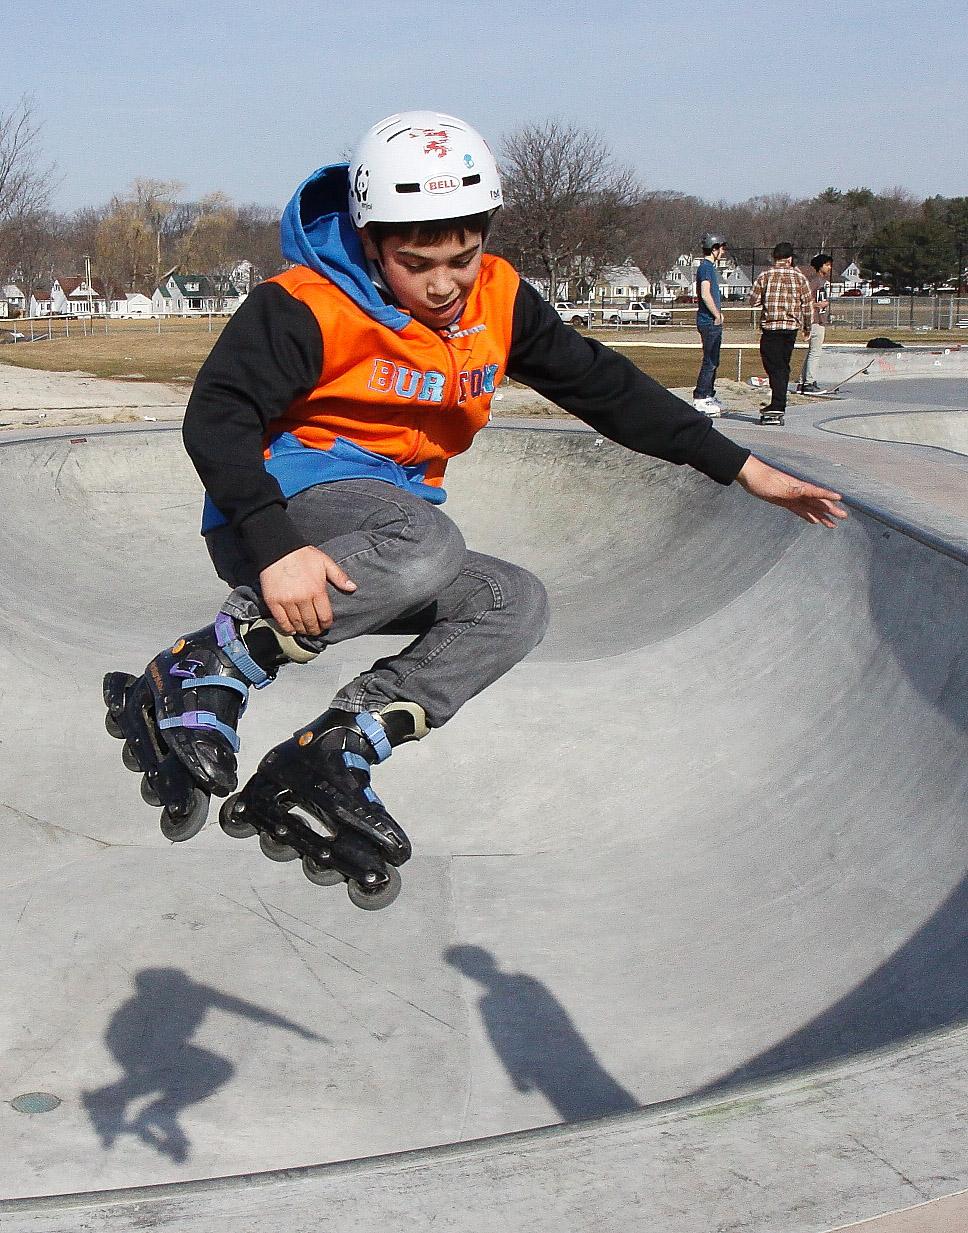 2012 Portland Skatepark 4359-1.jpg